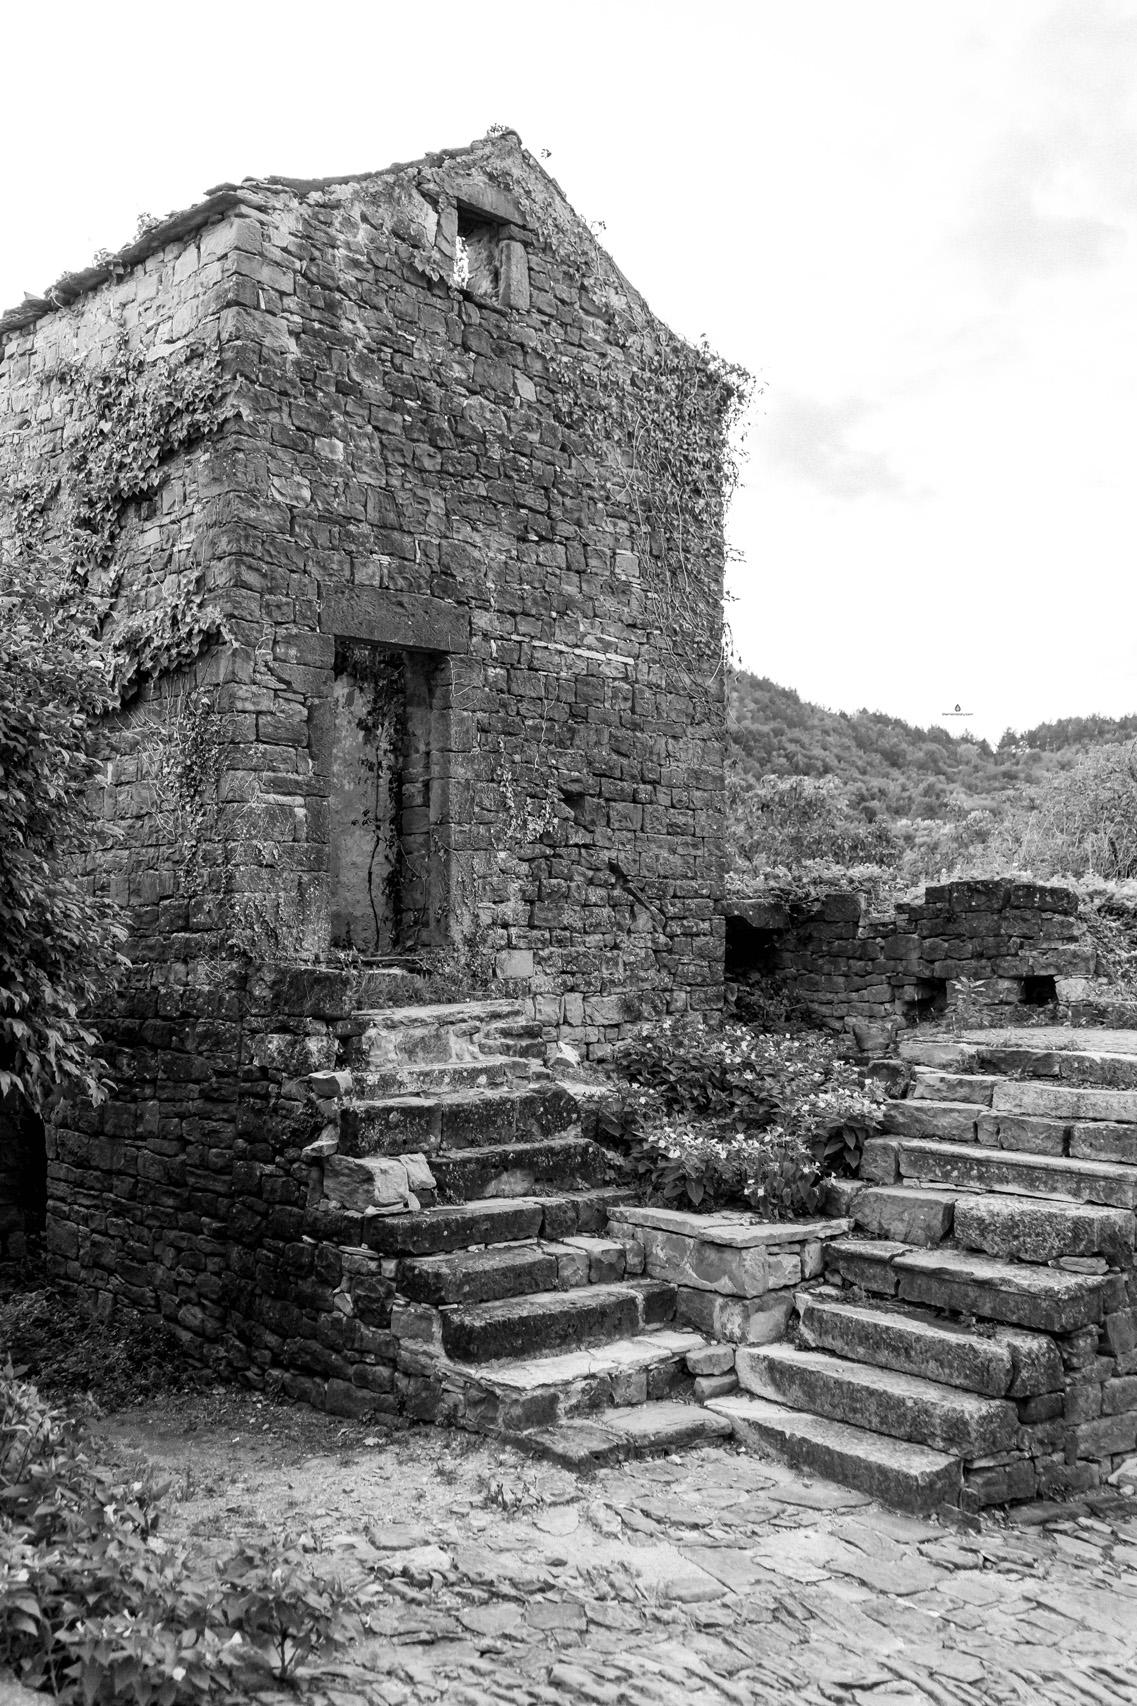 Abandoned houses of Zavrsje, Istria